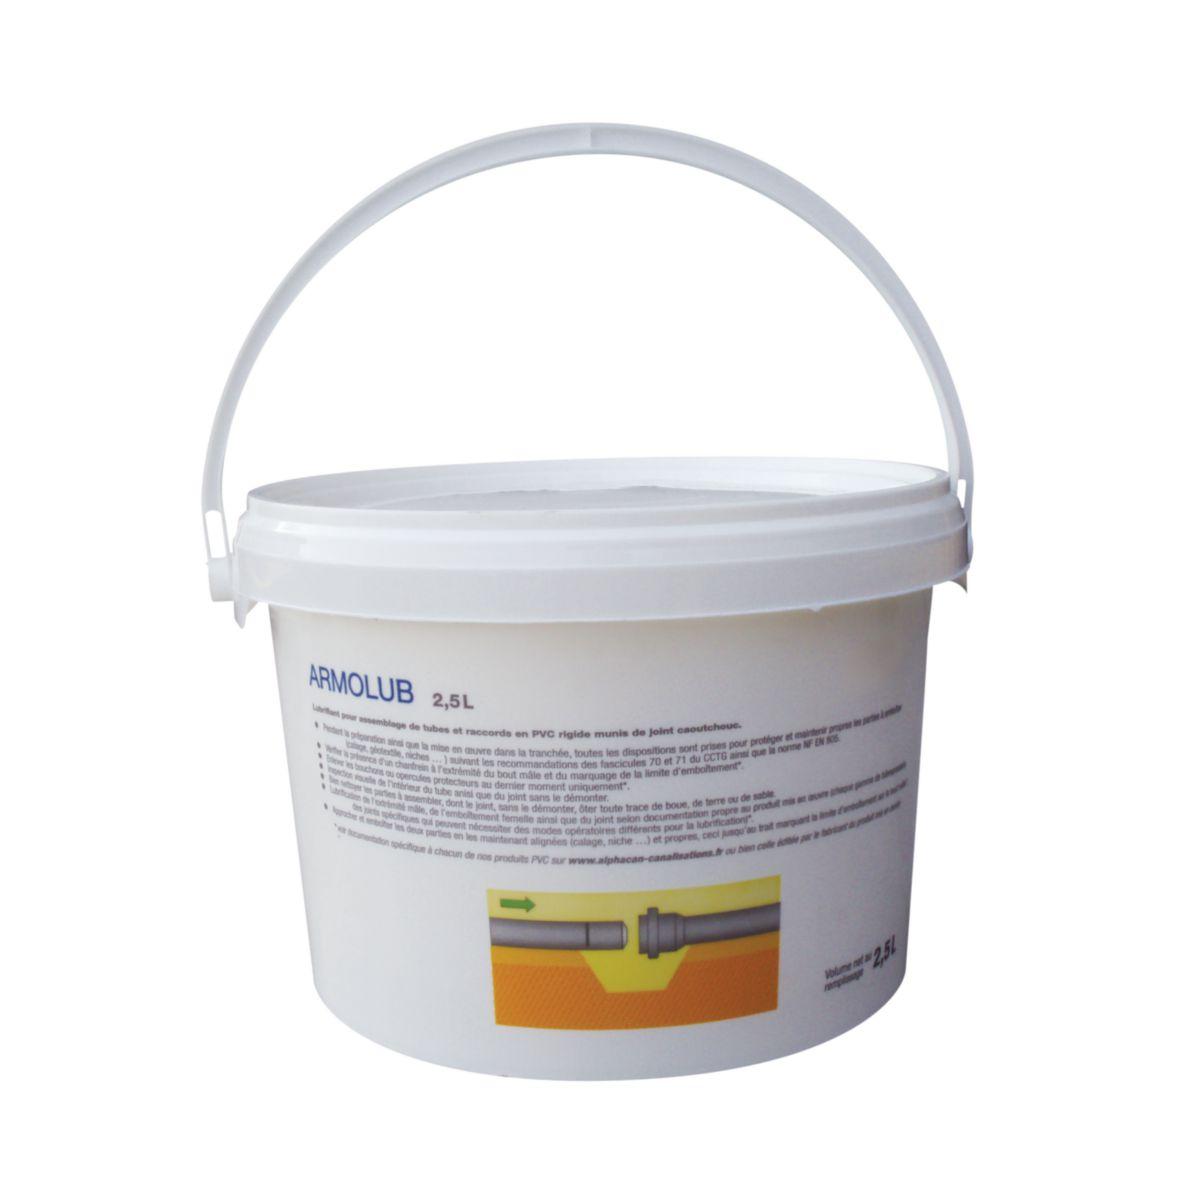 Pipelife Pâte Lubrifiante Pour Tube Pvcpp Rigide Armolub